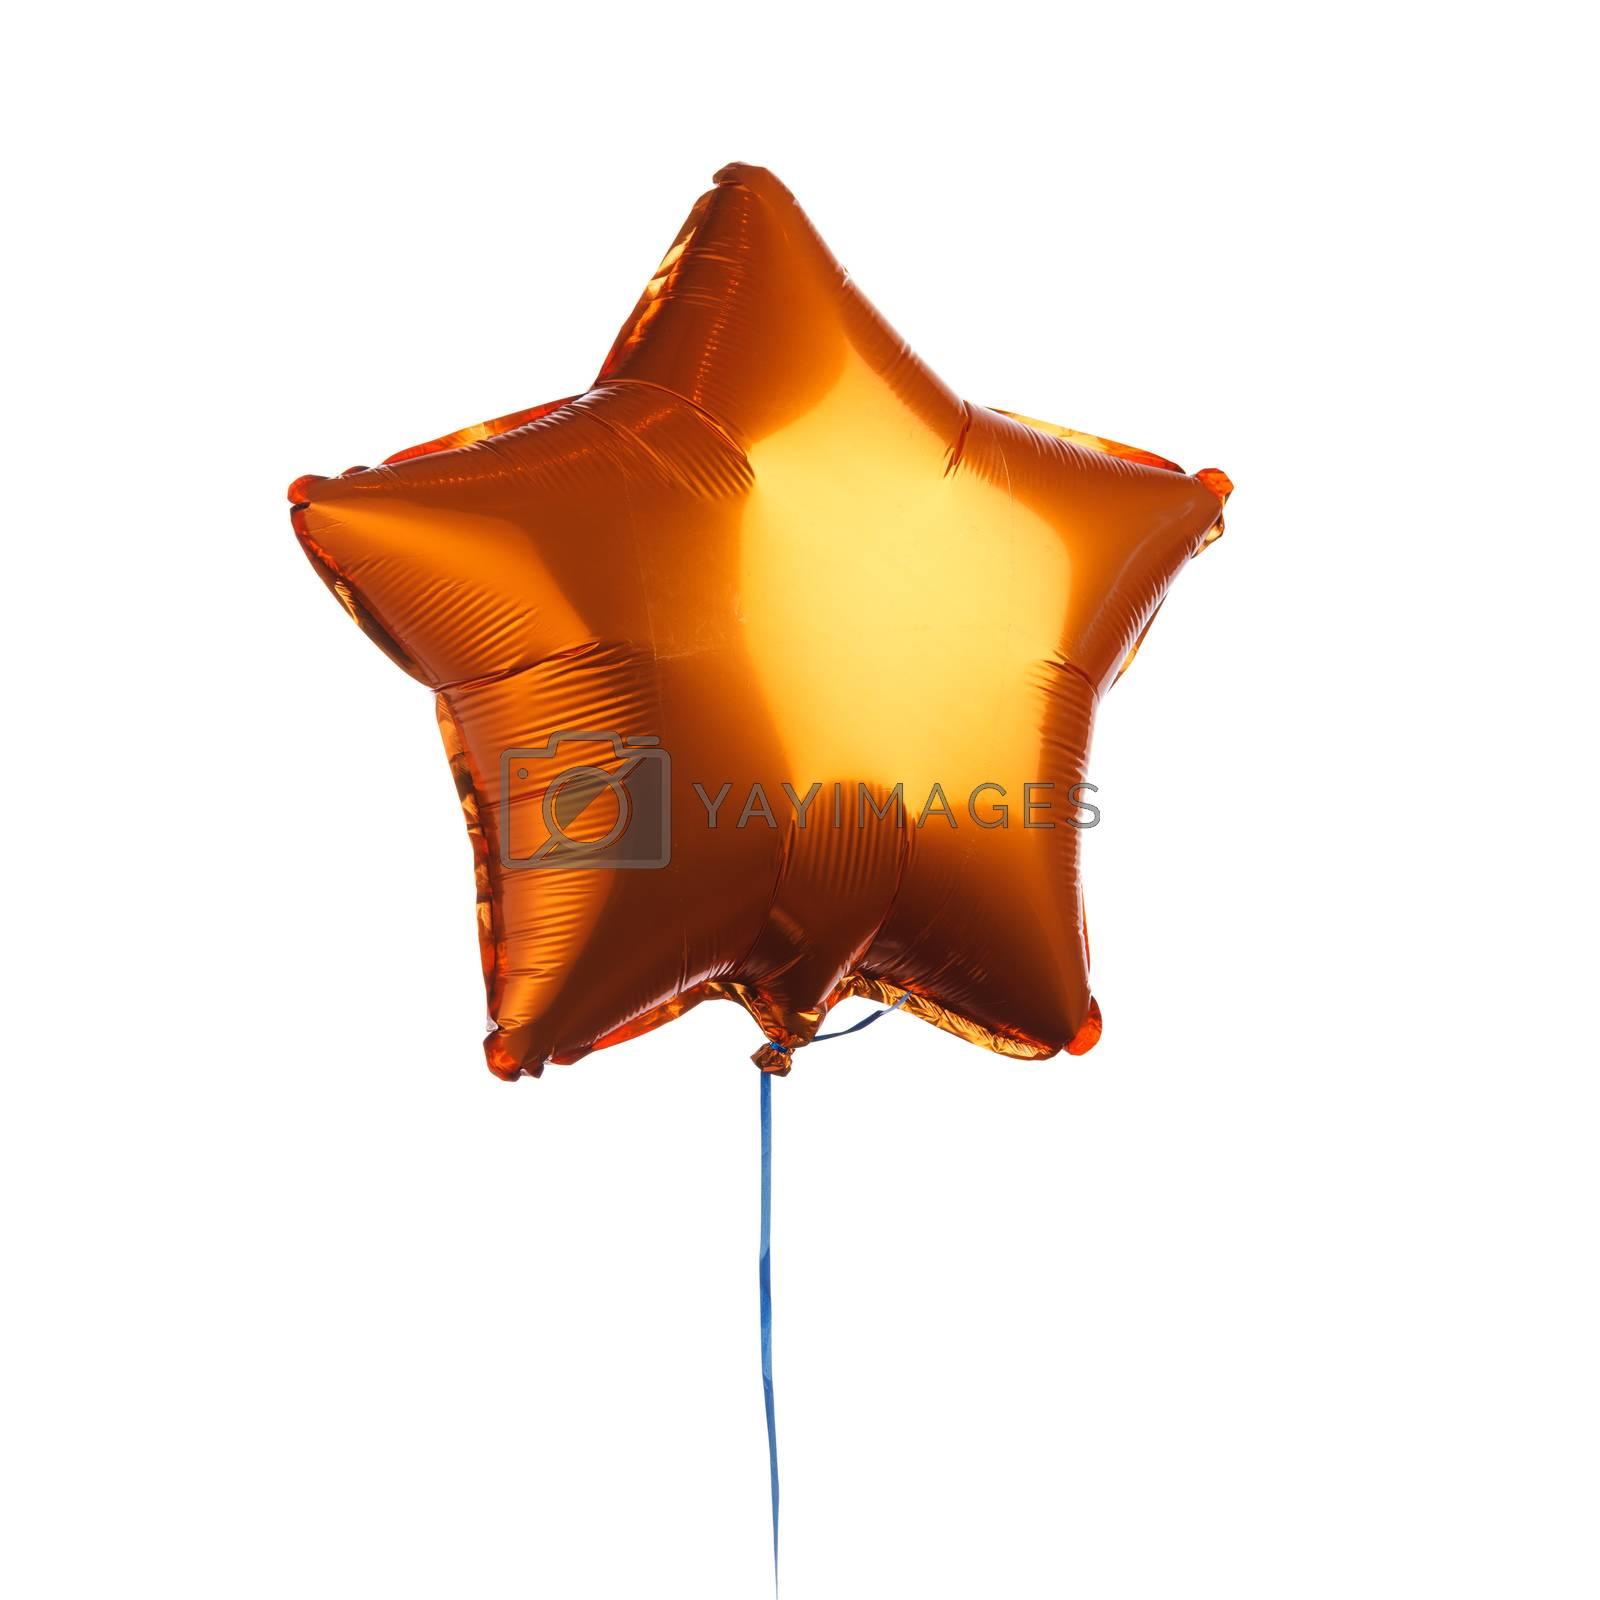 orange star balloon, isolated on white